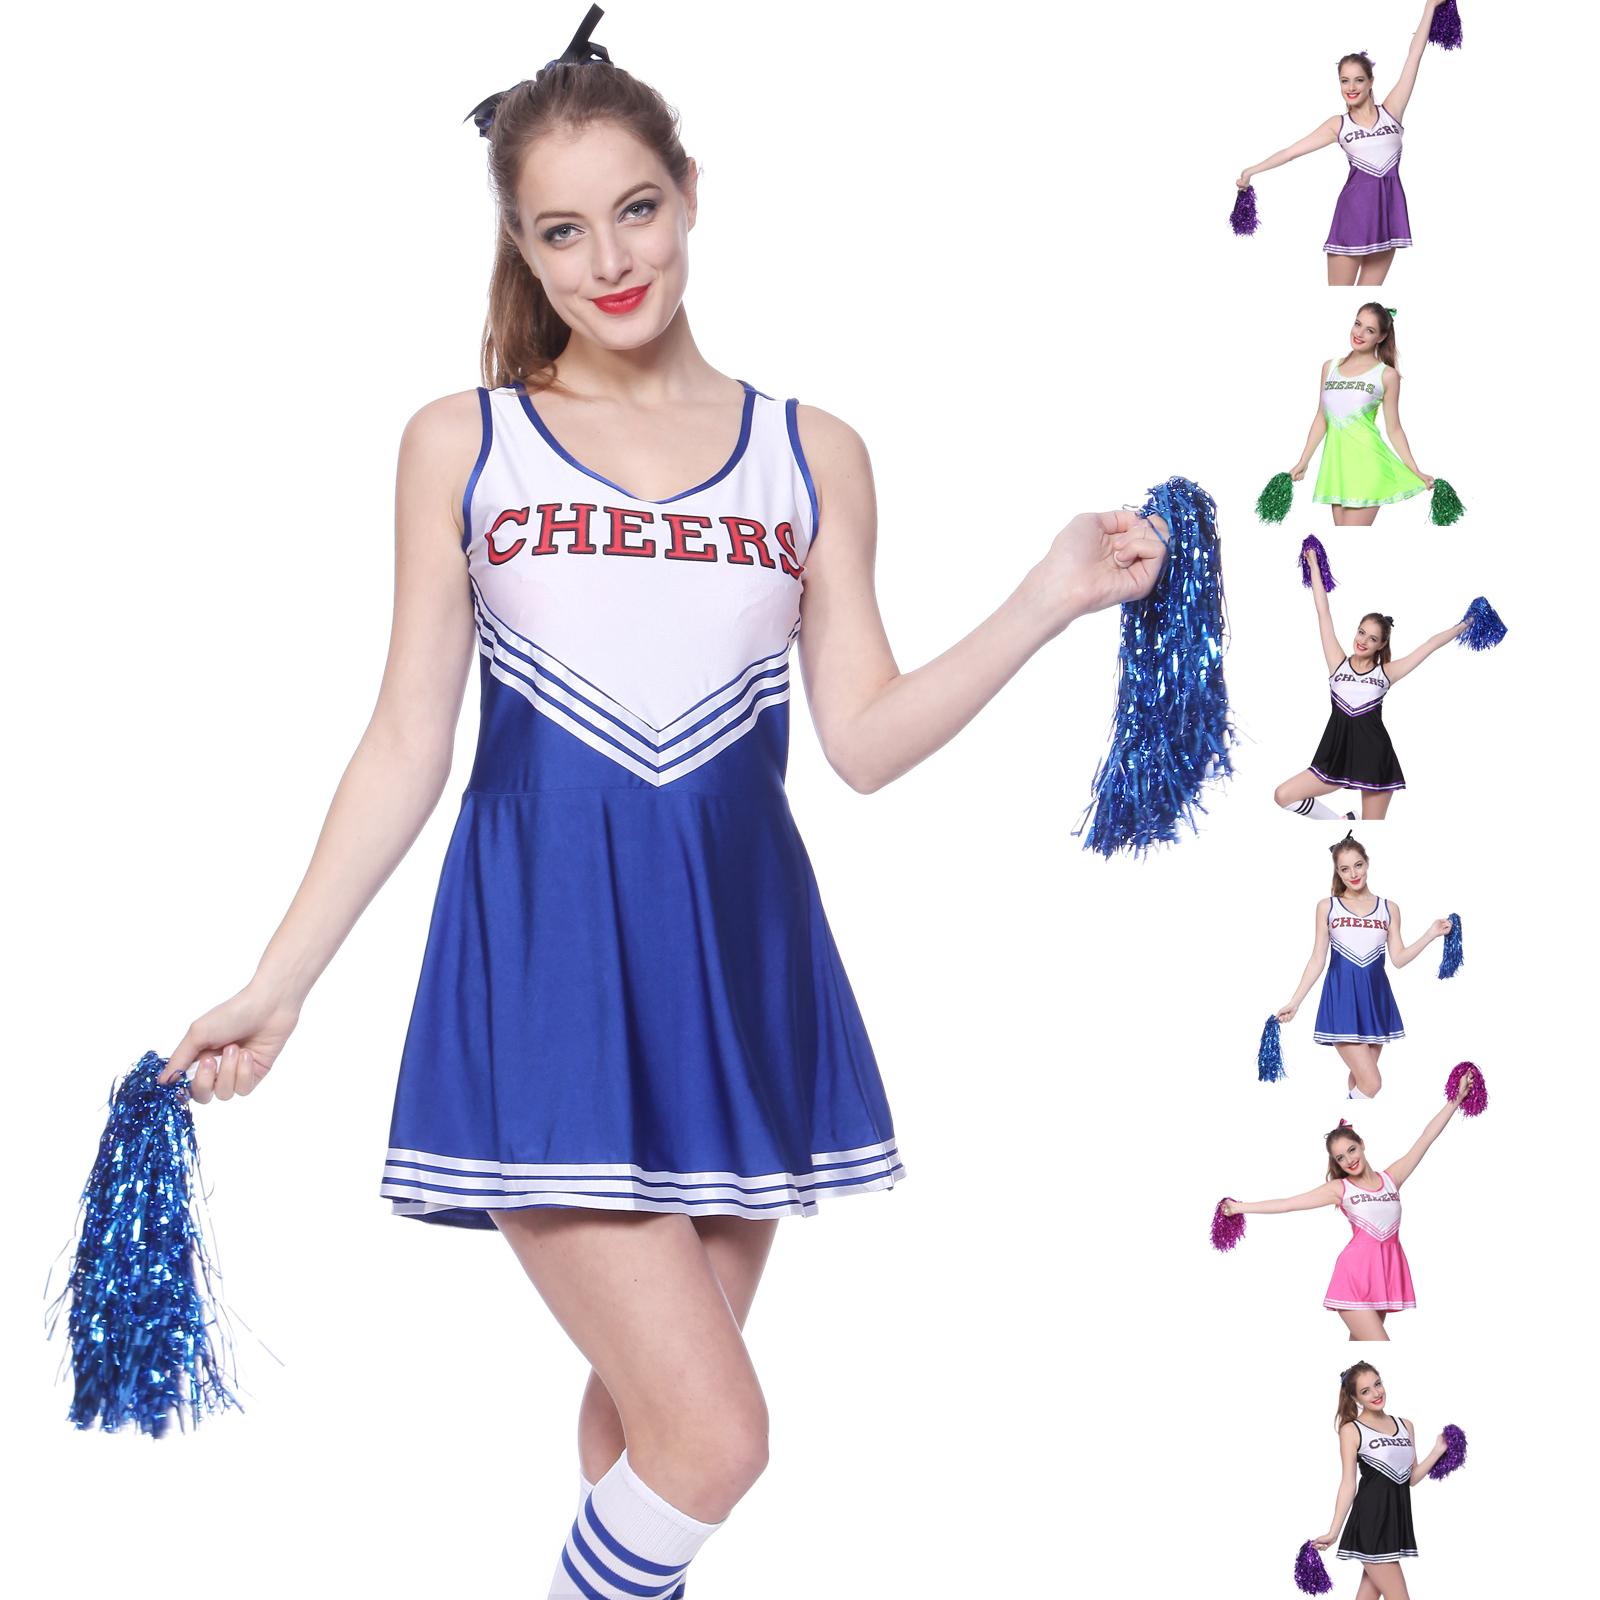 Cheerleader Costume | eBay